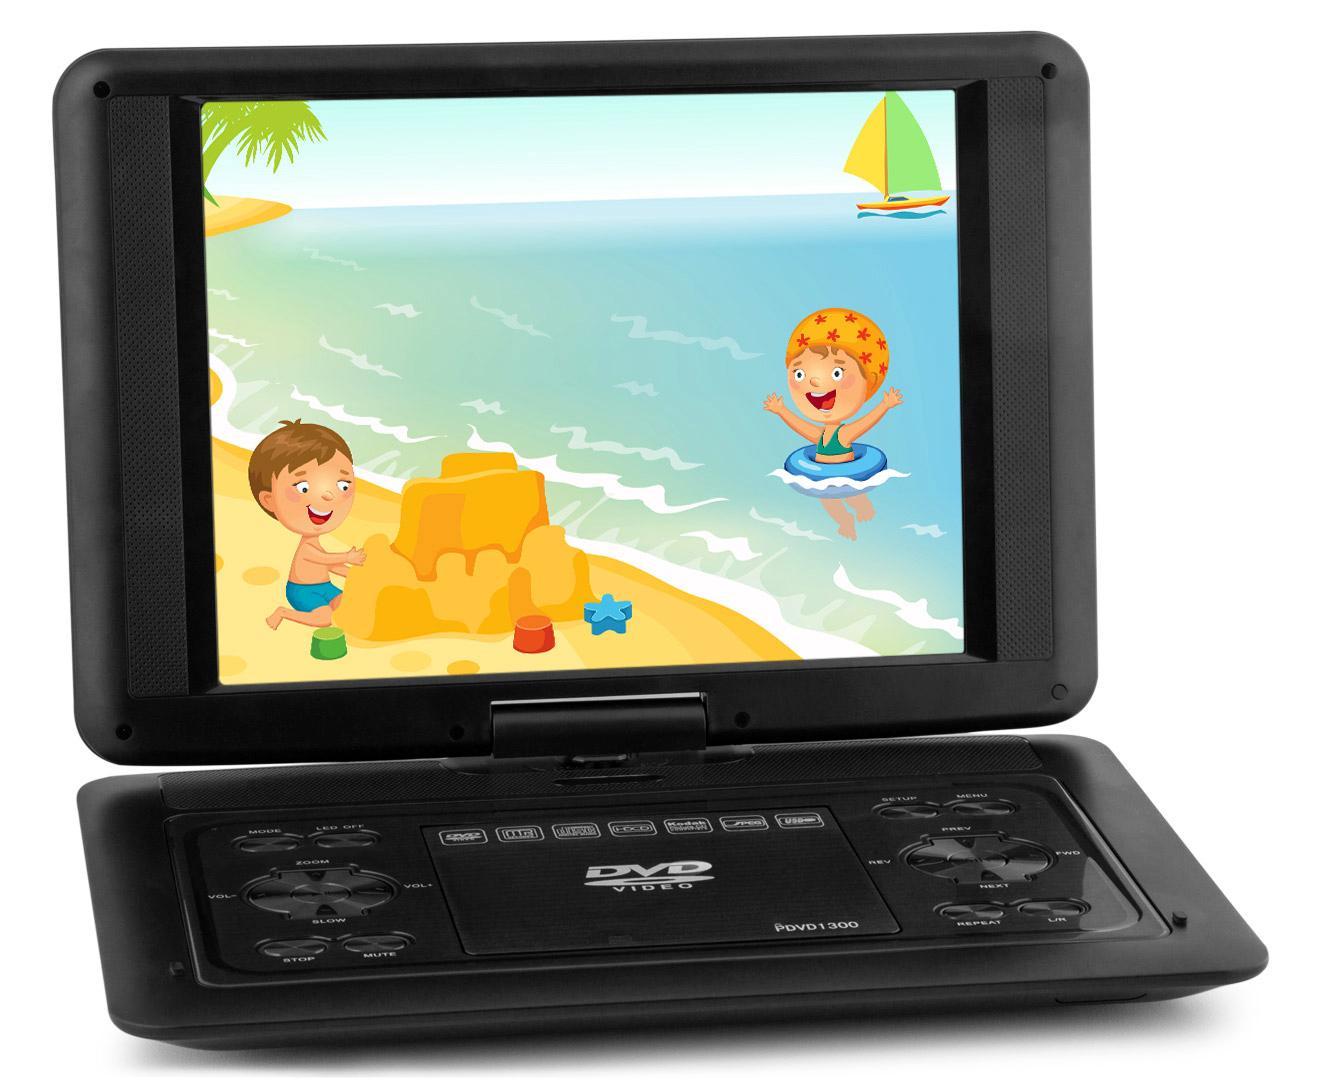 portable 13 inch dvd player ebay. Black Bedroom Furniture Sets. Home Design Ideas